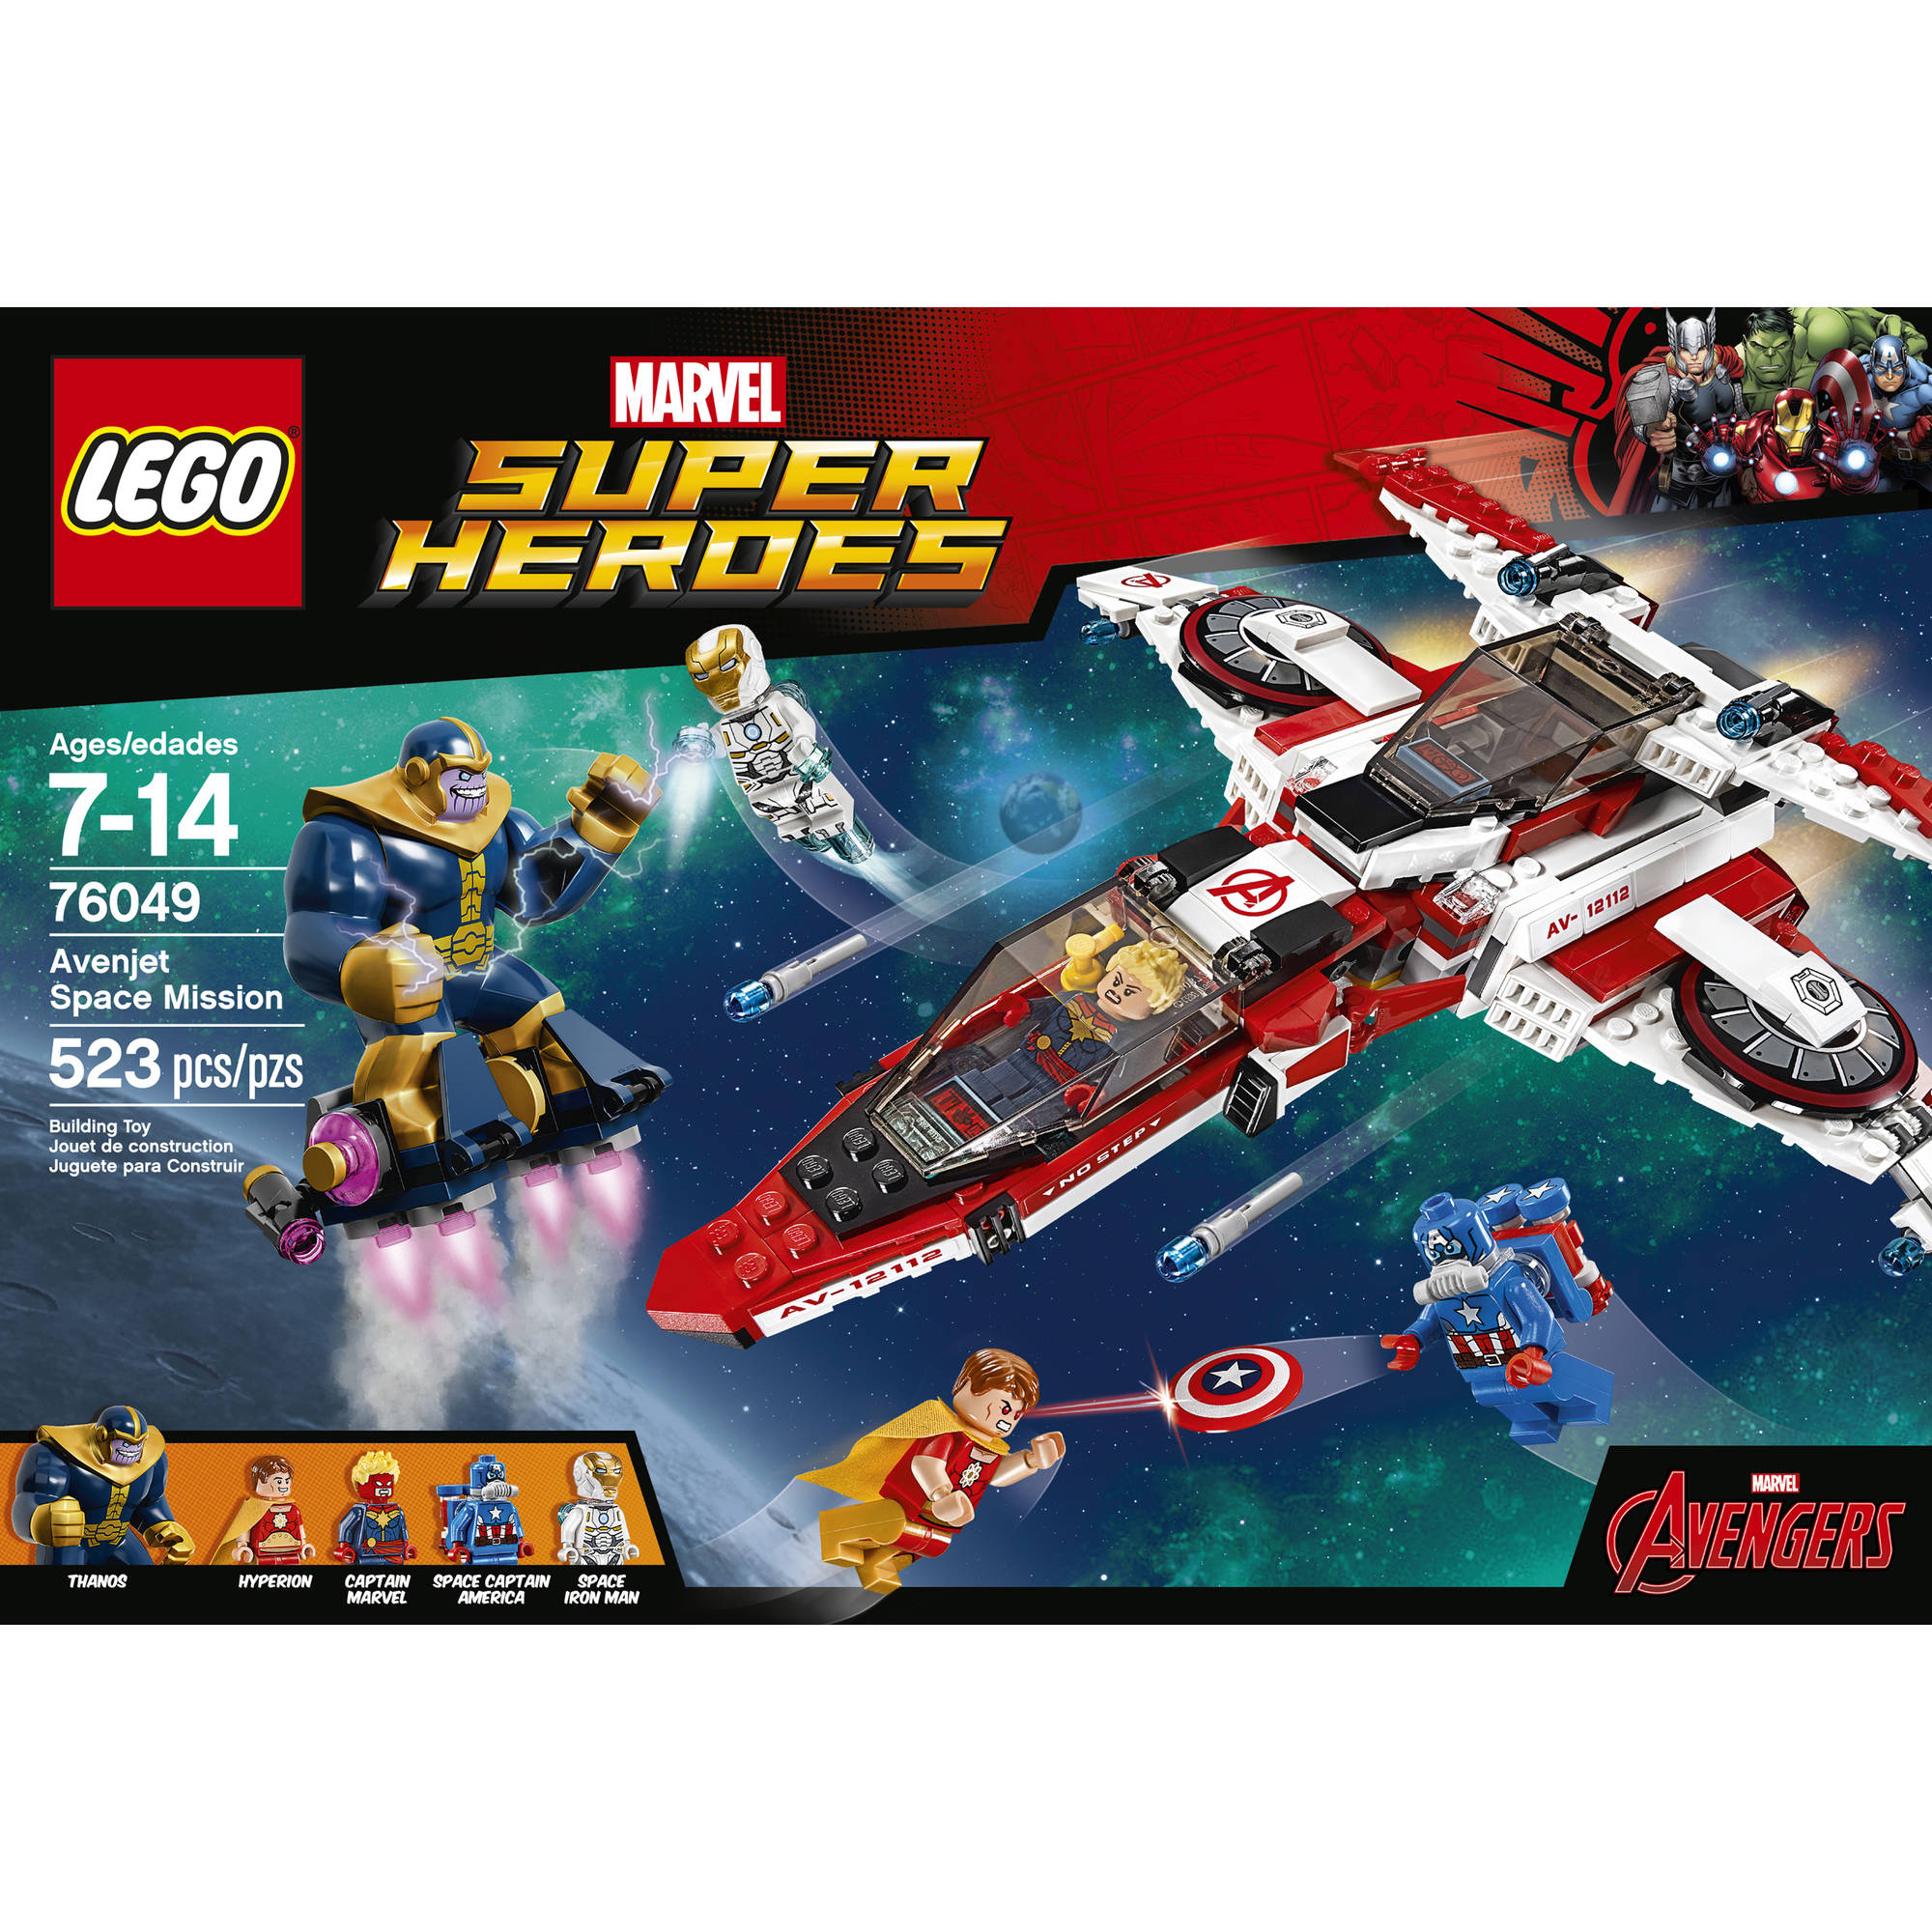 Space Super Heroes Mission76049 Avenjet Lego xQrdtshC